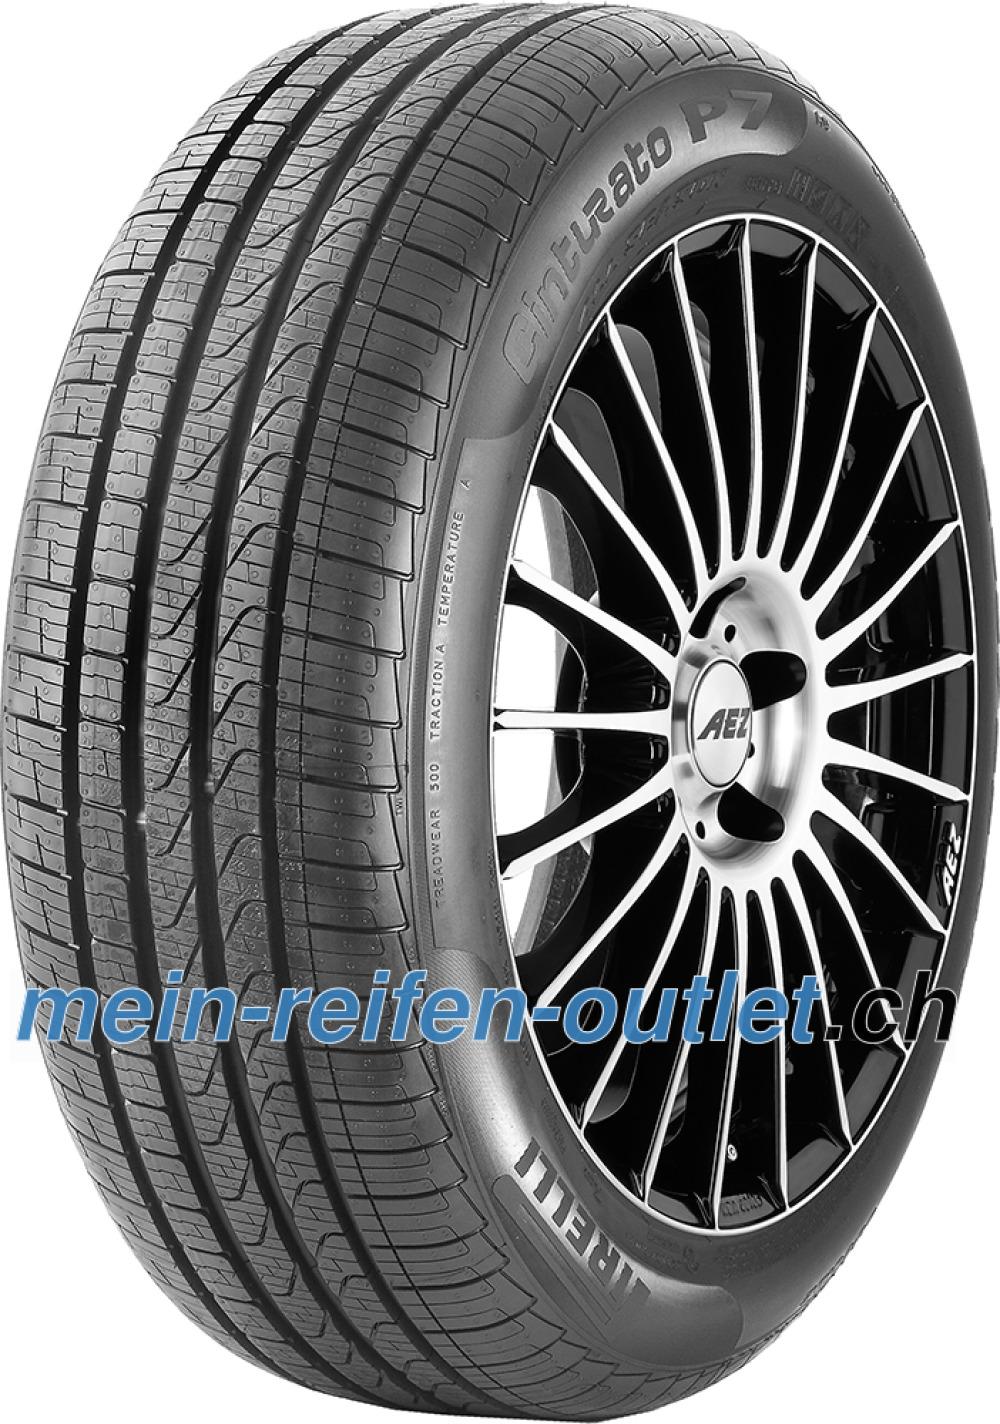 Pirelli Cinturato P7 A/S ( 285/40 R19 103V ECOIMPACT, N0, mit Felgenschutz (MFS) )